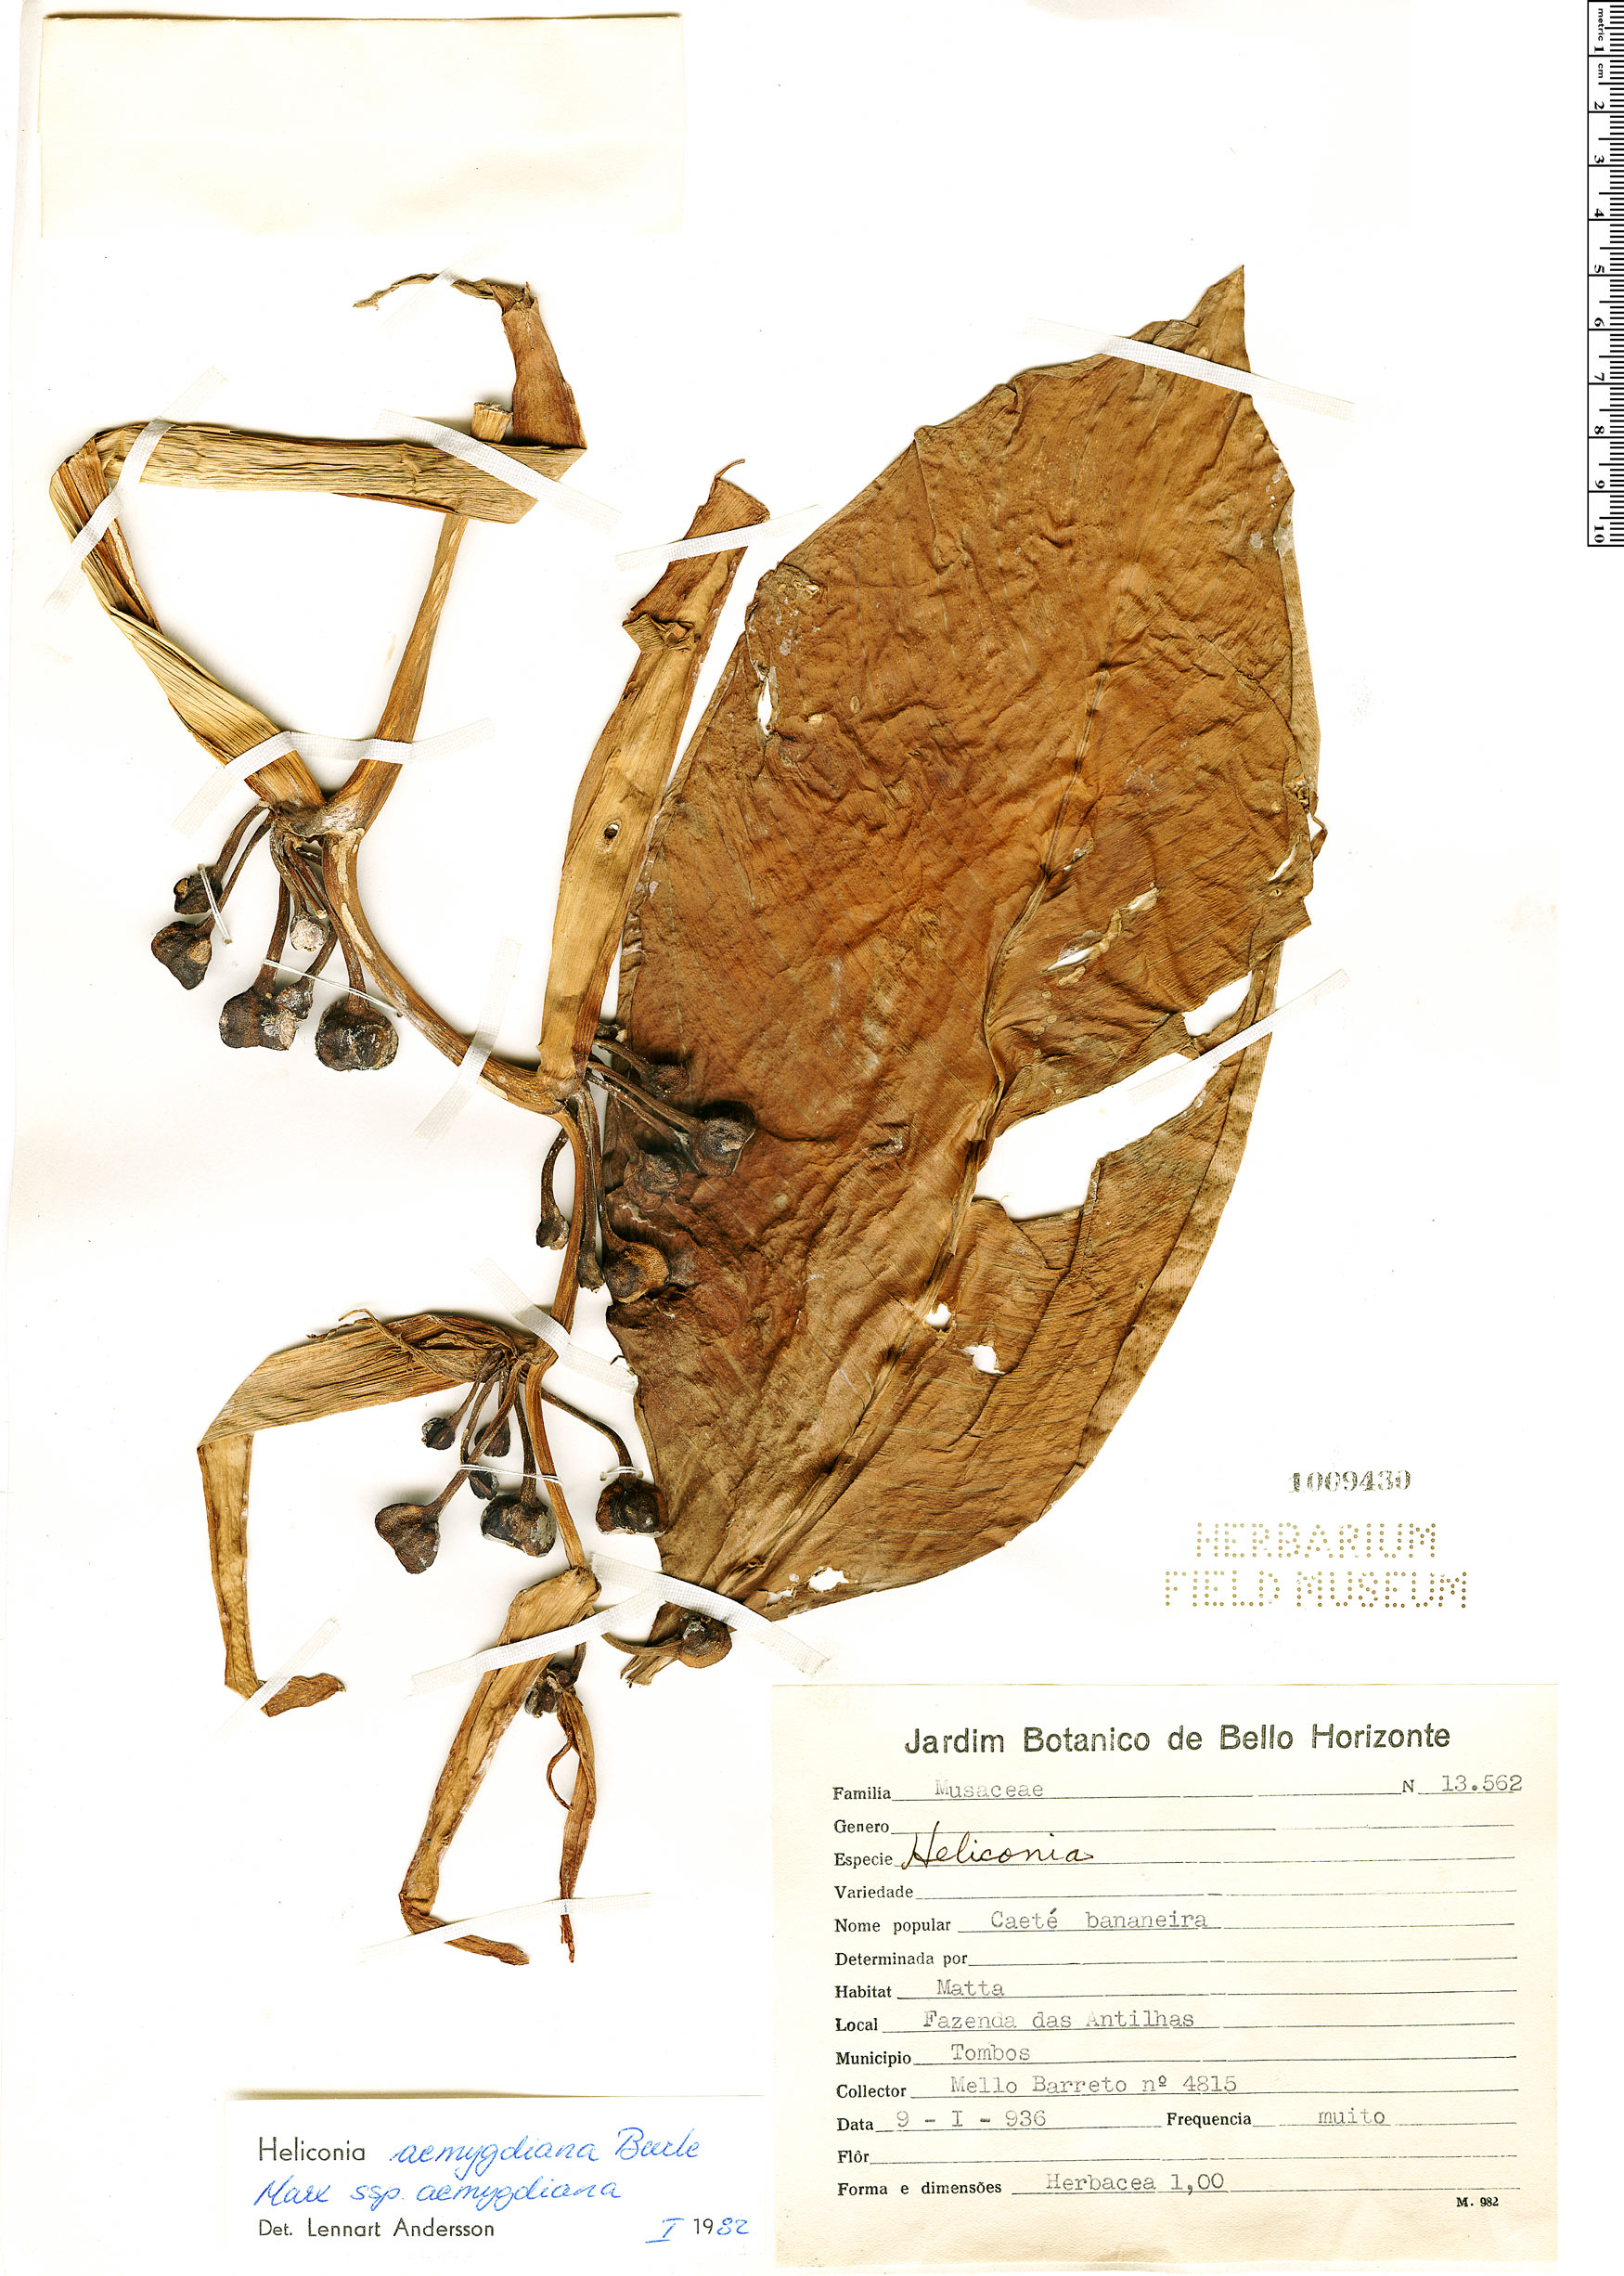 Espécimen: Heliconia aemygdiana